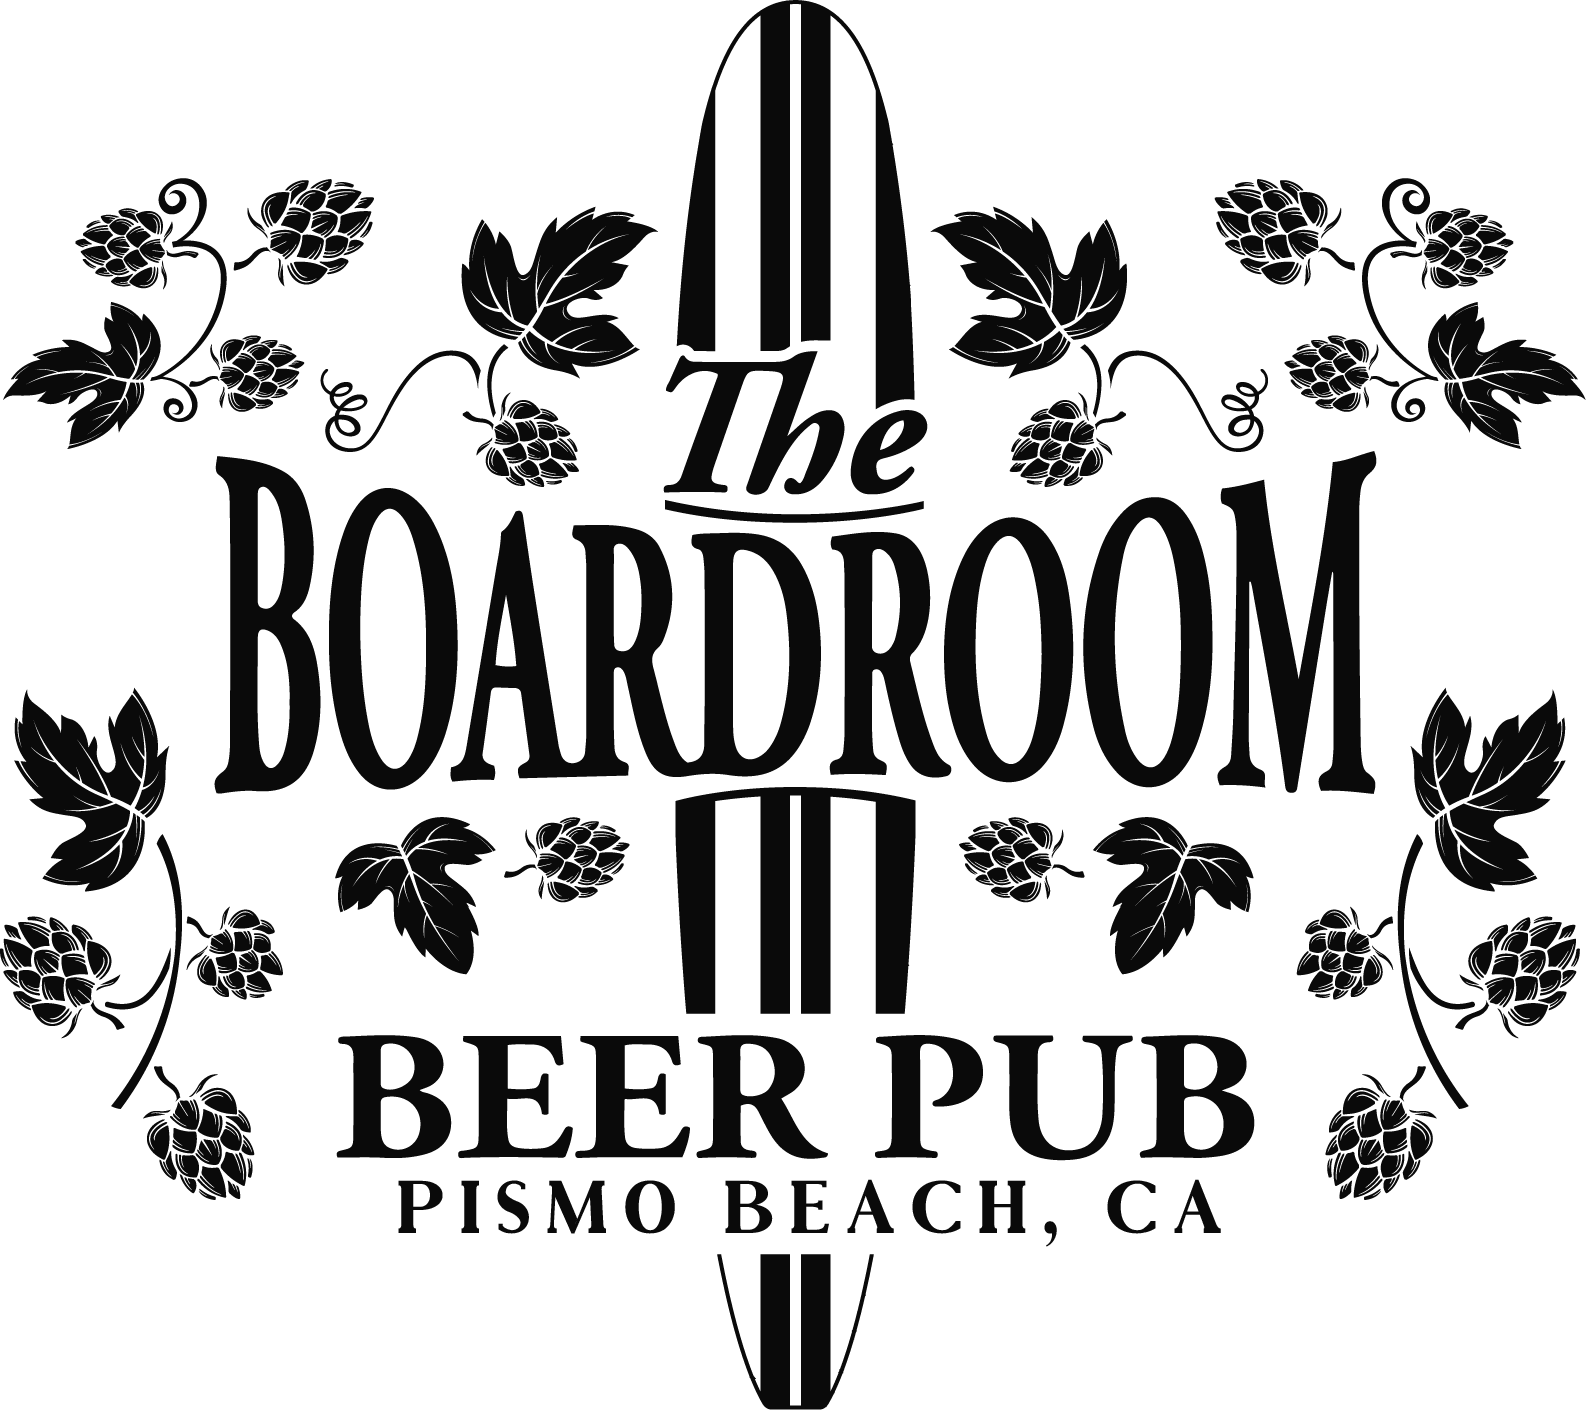 Beer List The Board Room